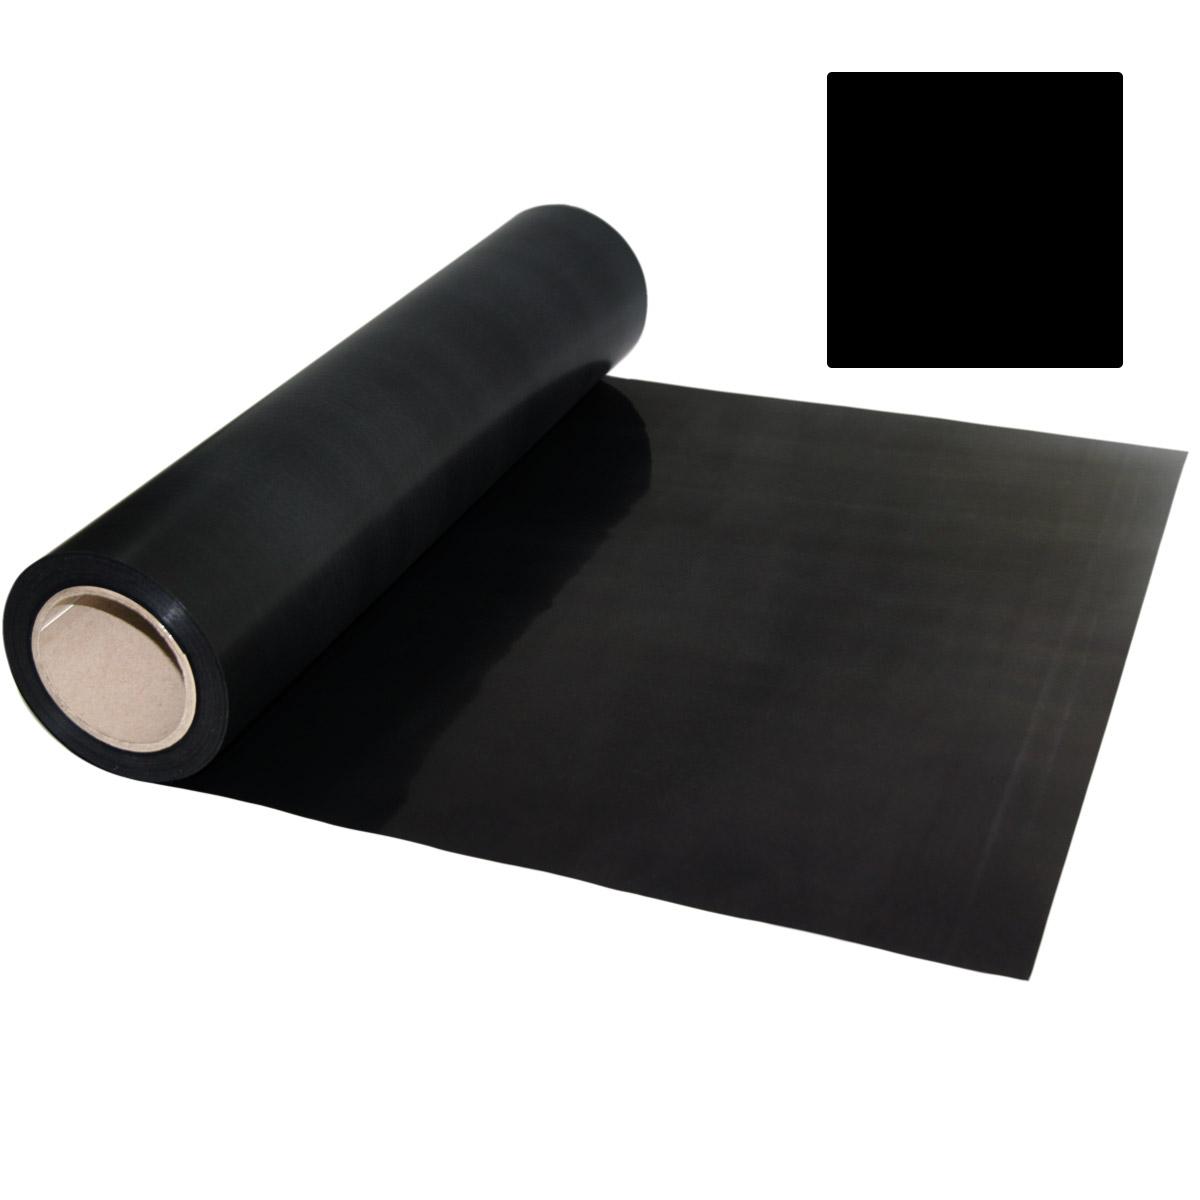 Folia TopFlex pantone Process Black C